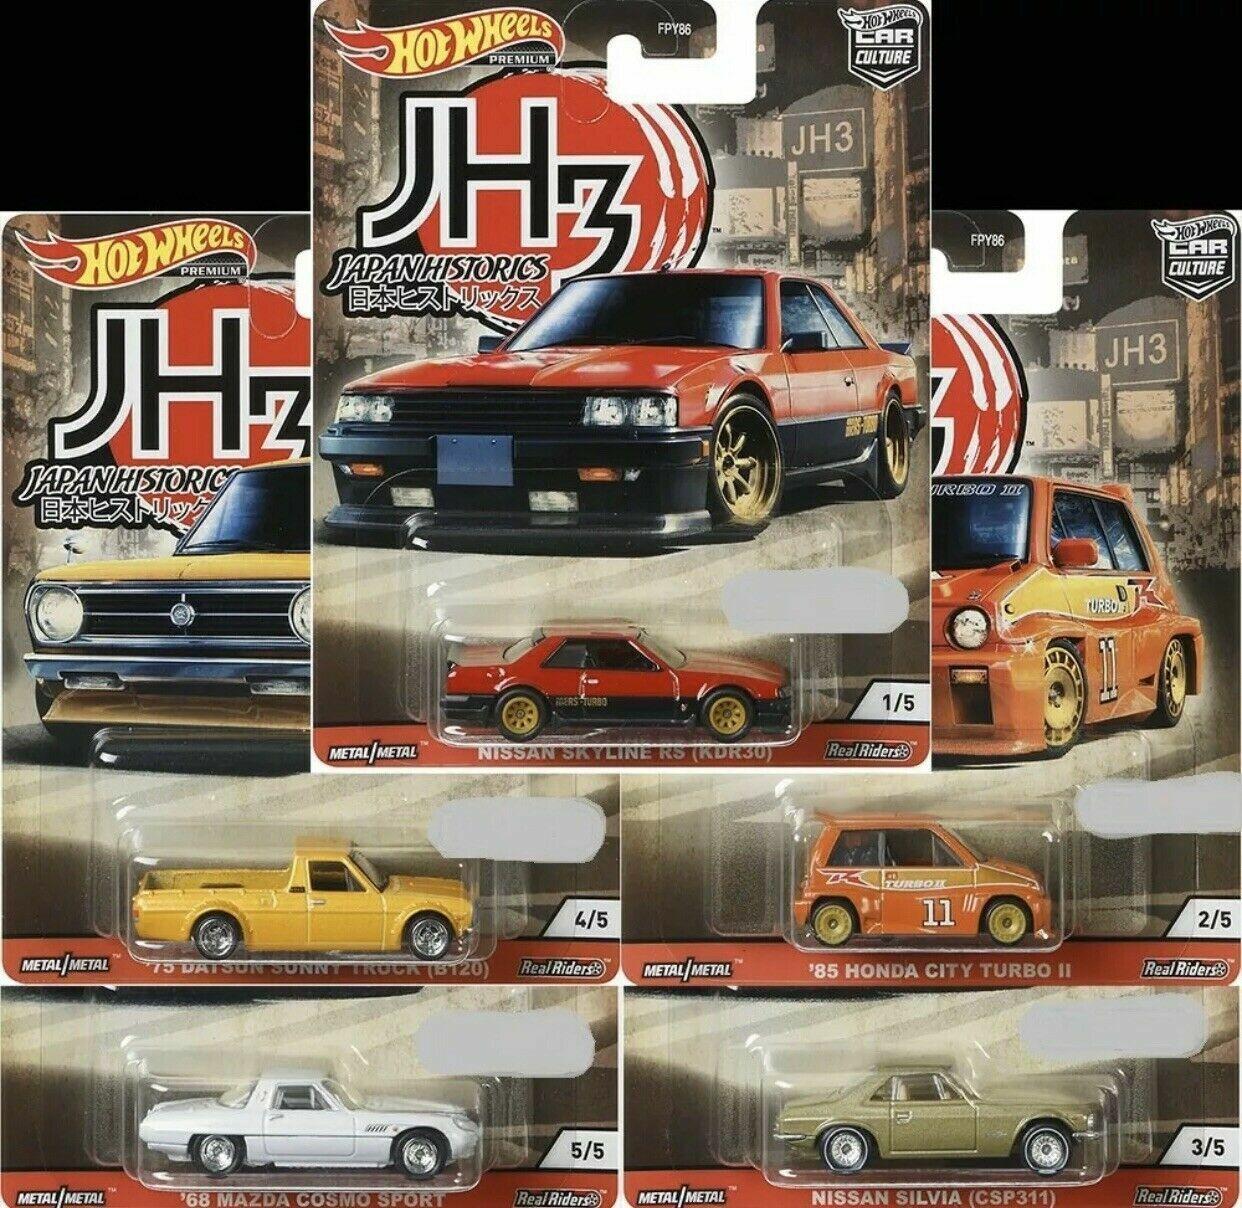 HOTWHEELS PRE ORDER 2020 JAPAN HISTORICS 3 FULL SET OF 5 ALLOYS RUBBER TYRES